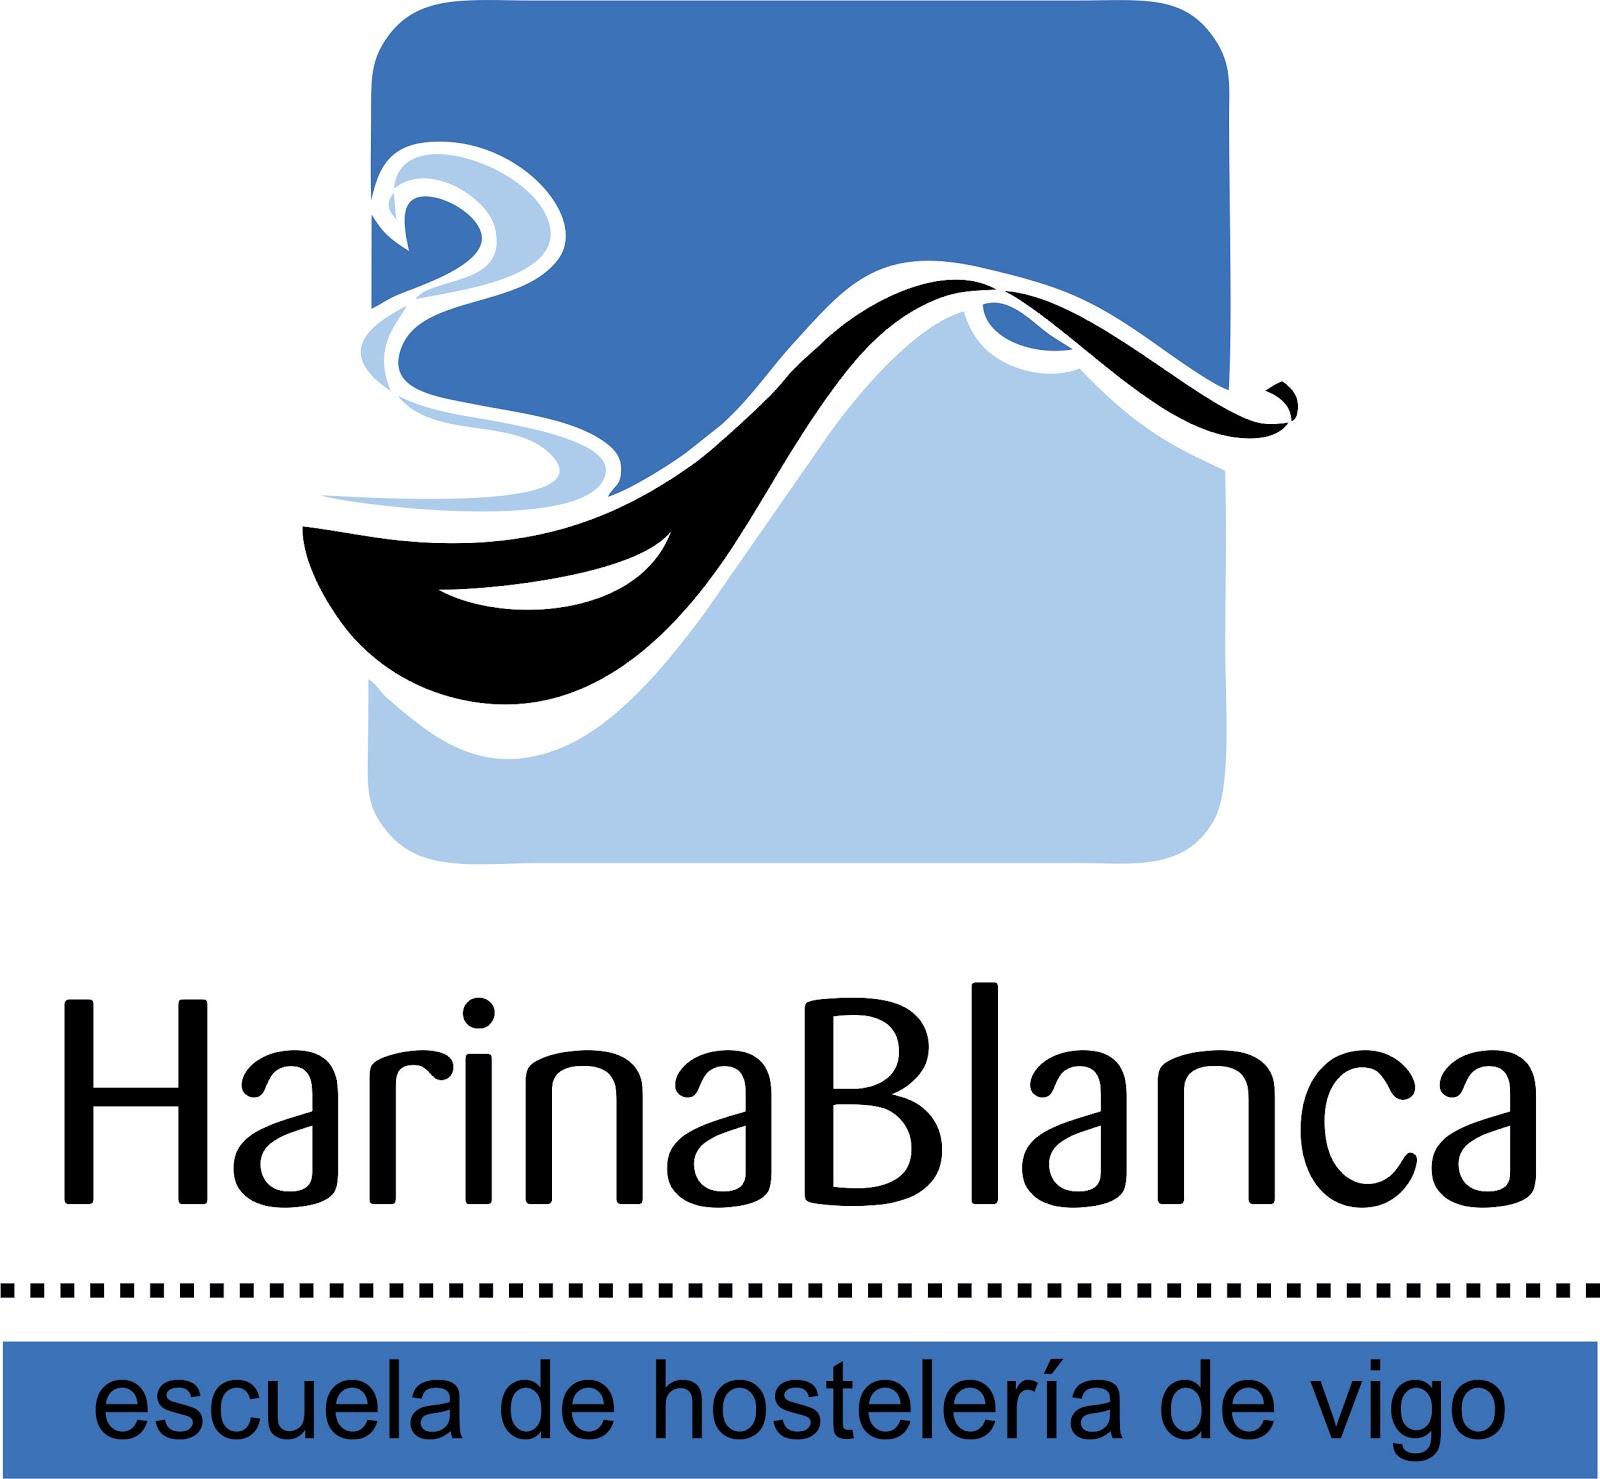 HARINA BLANCA